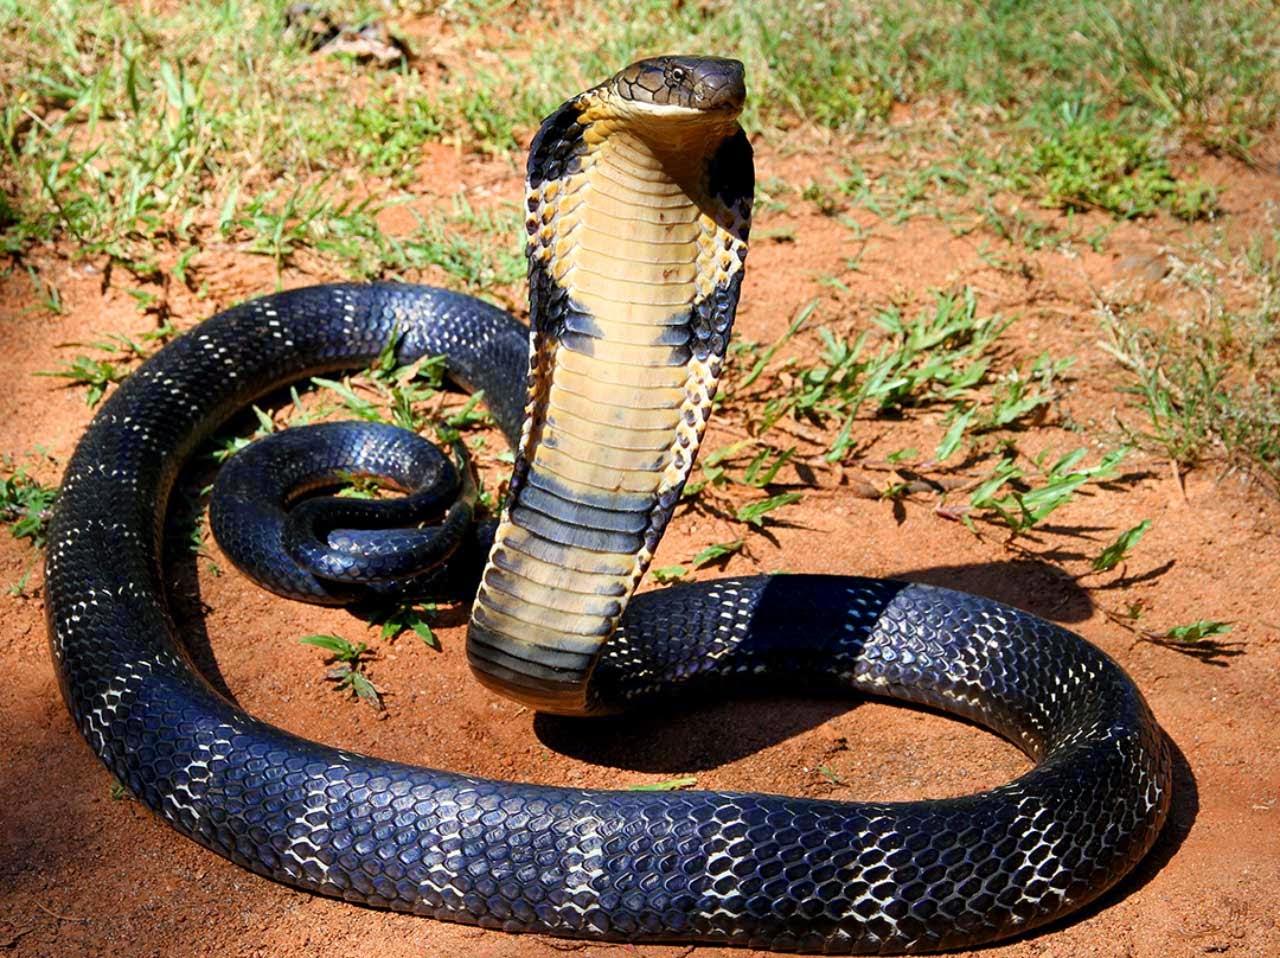 kerala snakes and reptiles